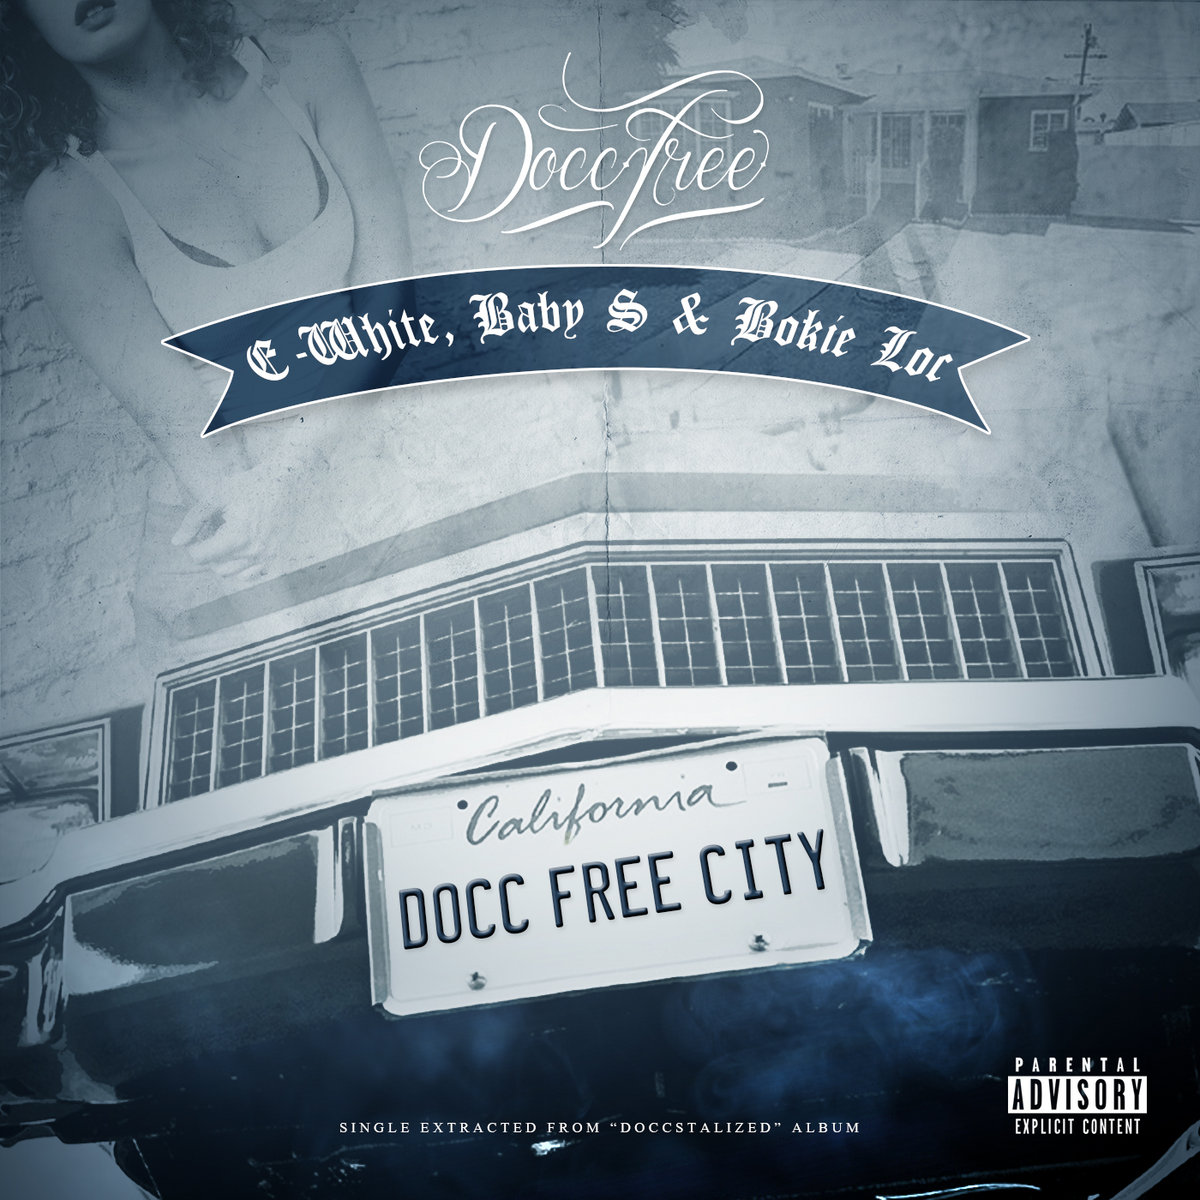 Docc Free City (Single + Instrumental) | Docc N Locc